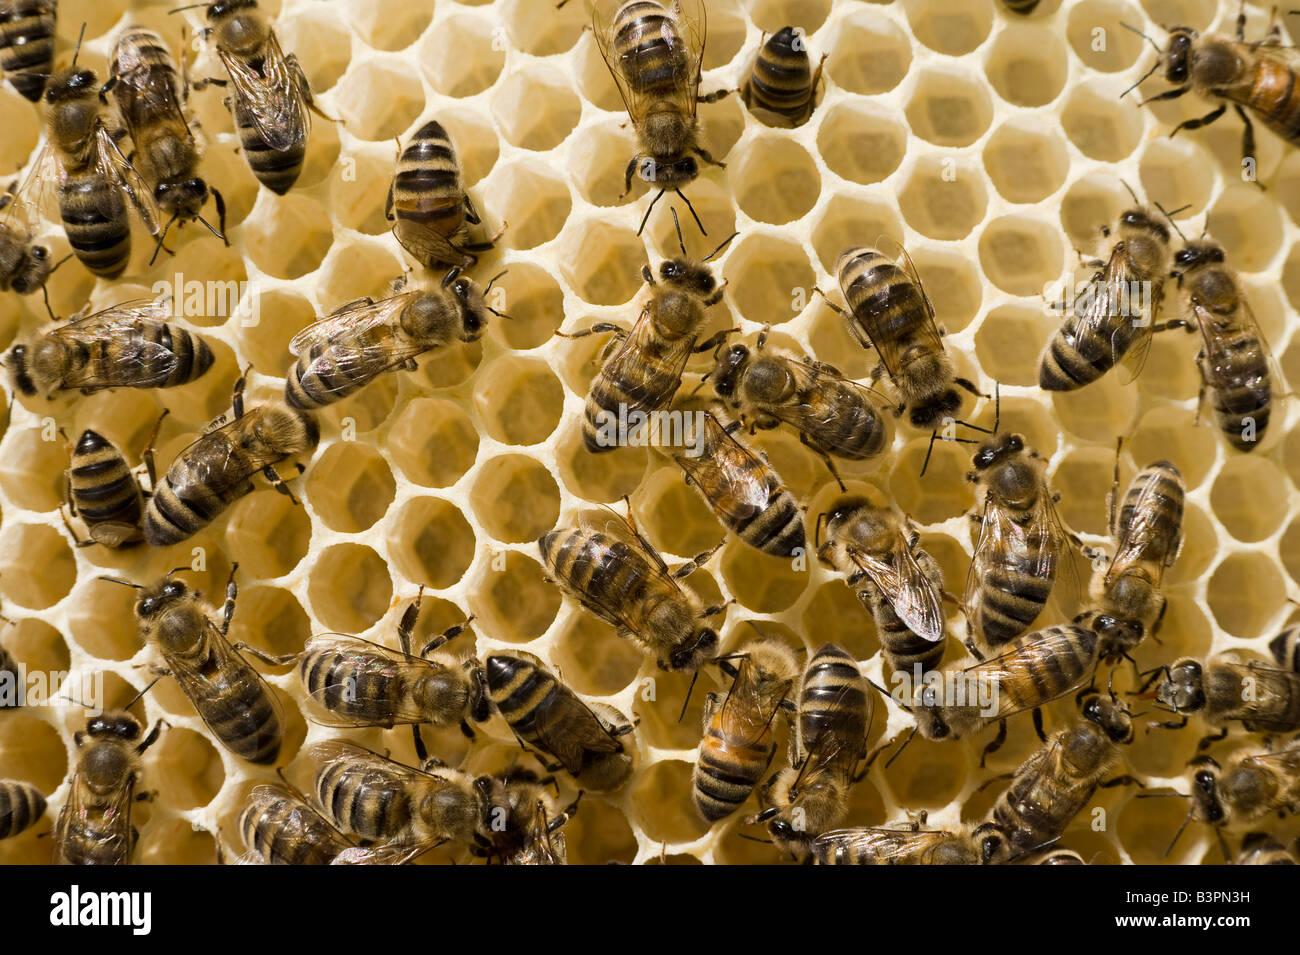 Bienen (Apis Melifera Carnica) in einem Bienenstock Stockbild